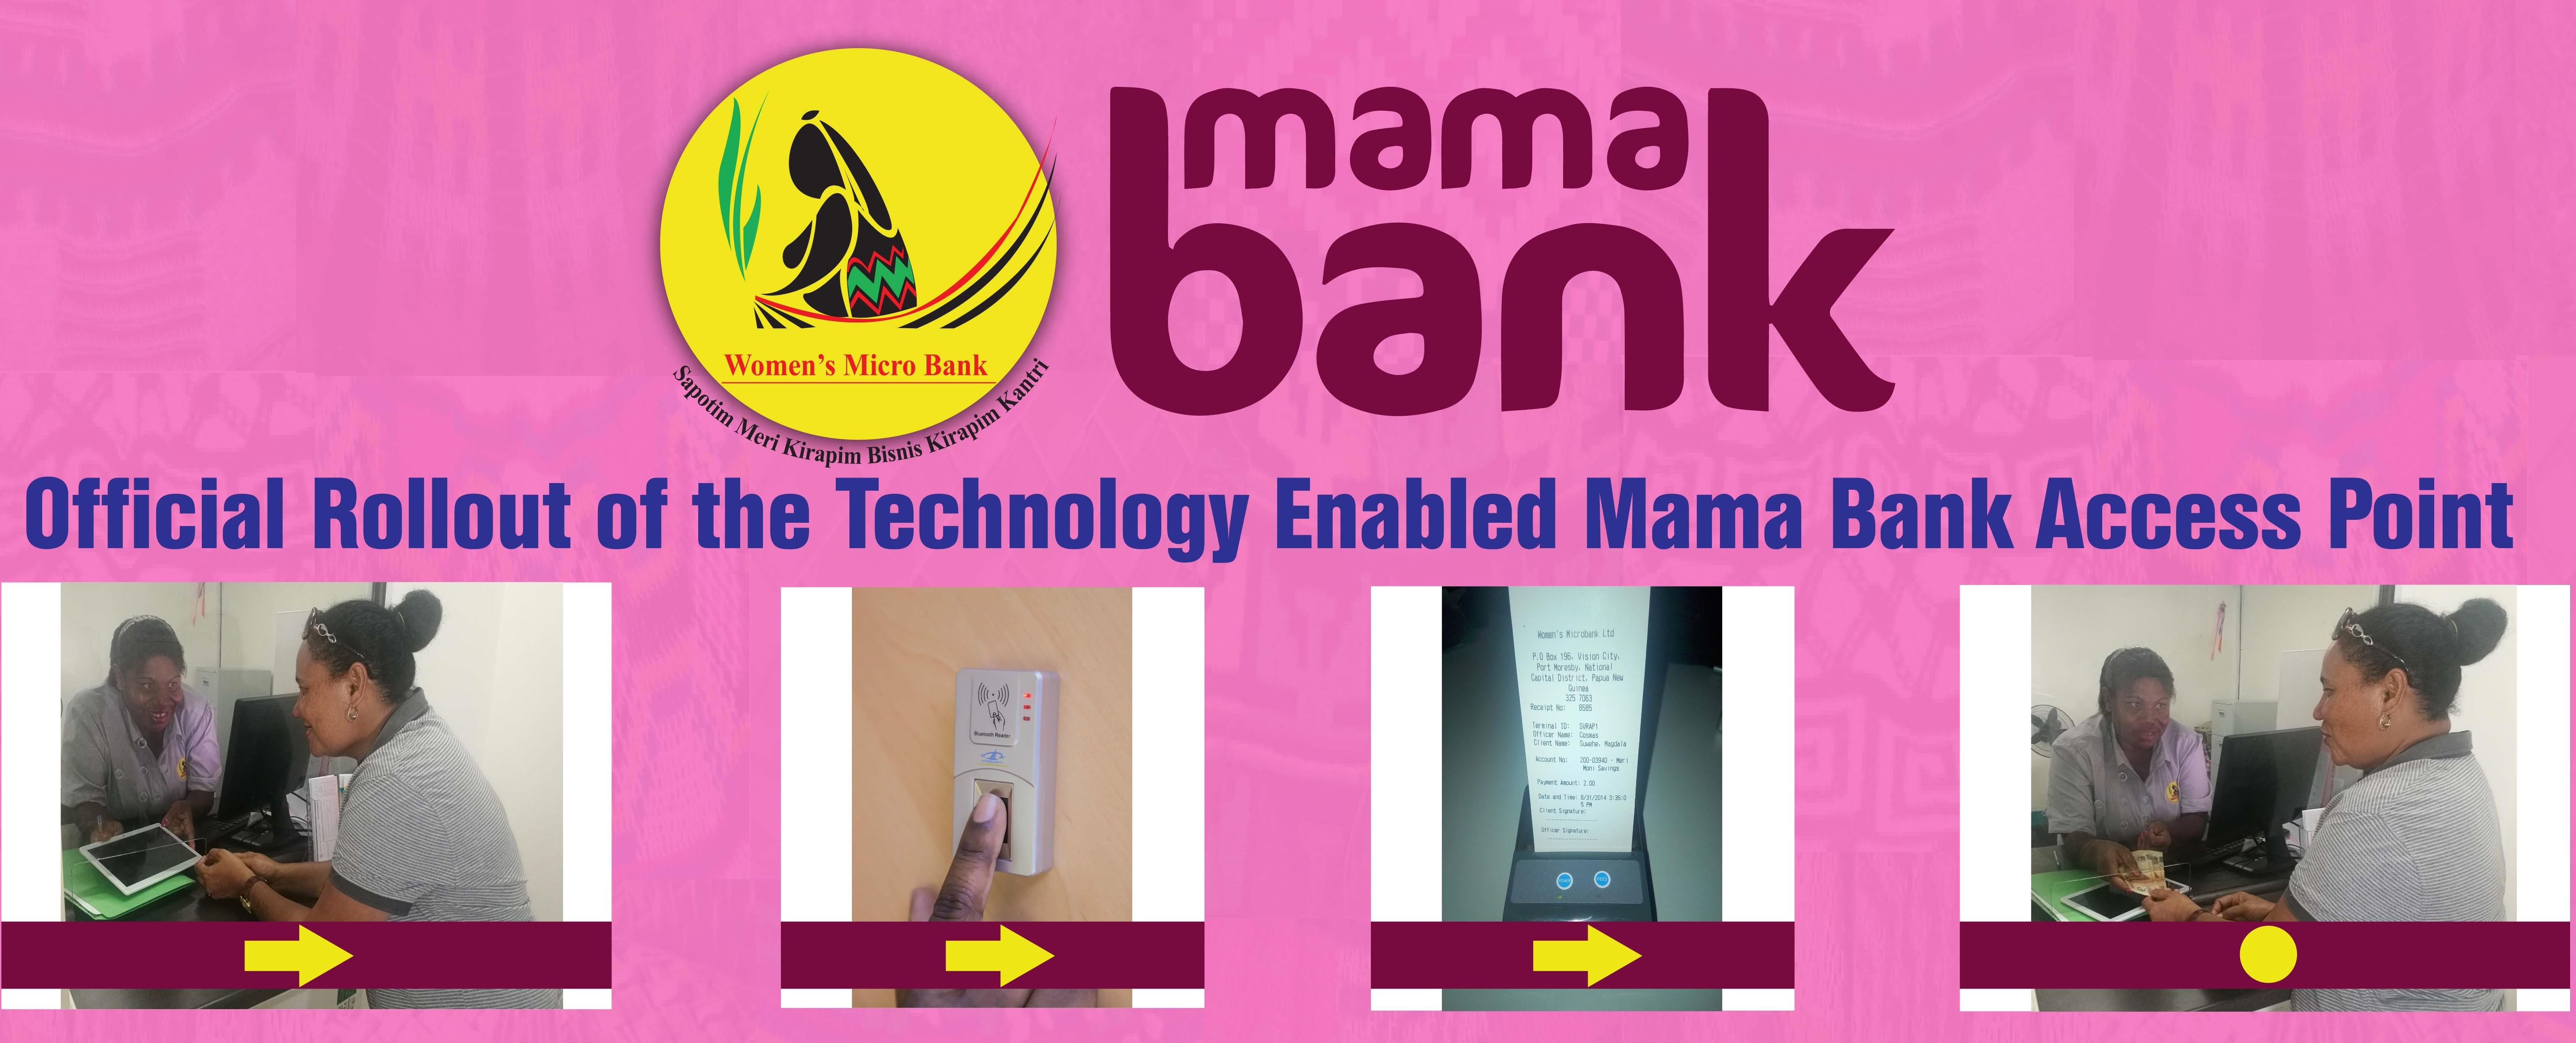 Banking with your thumbprint at WMBL's Mama Bank Access.